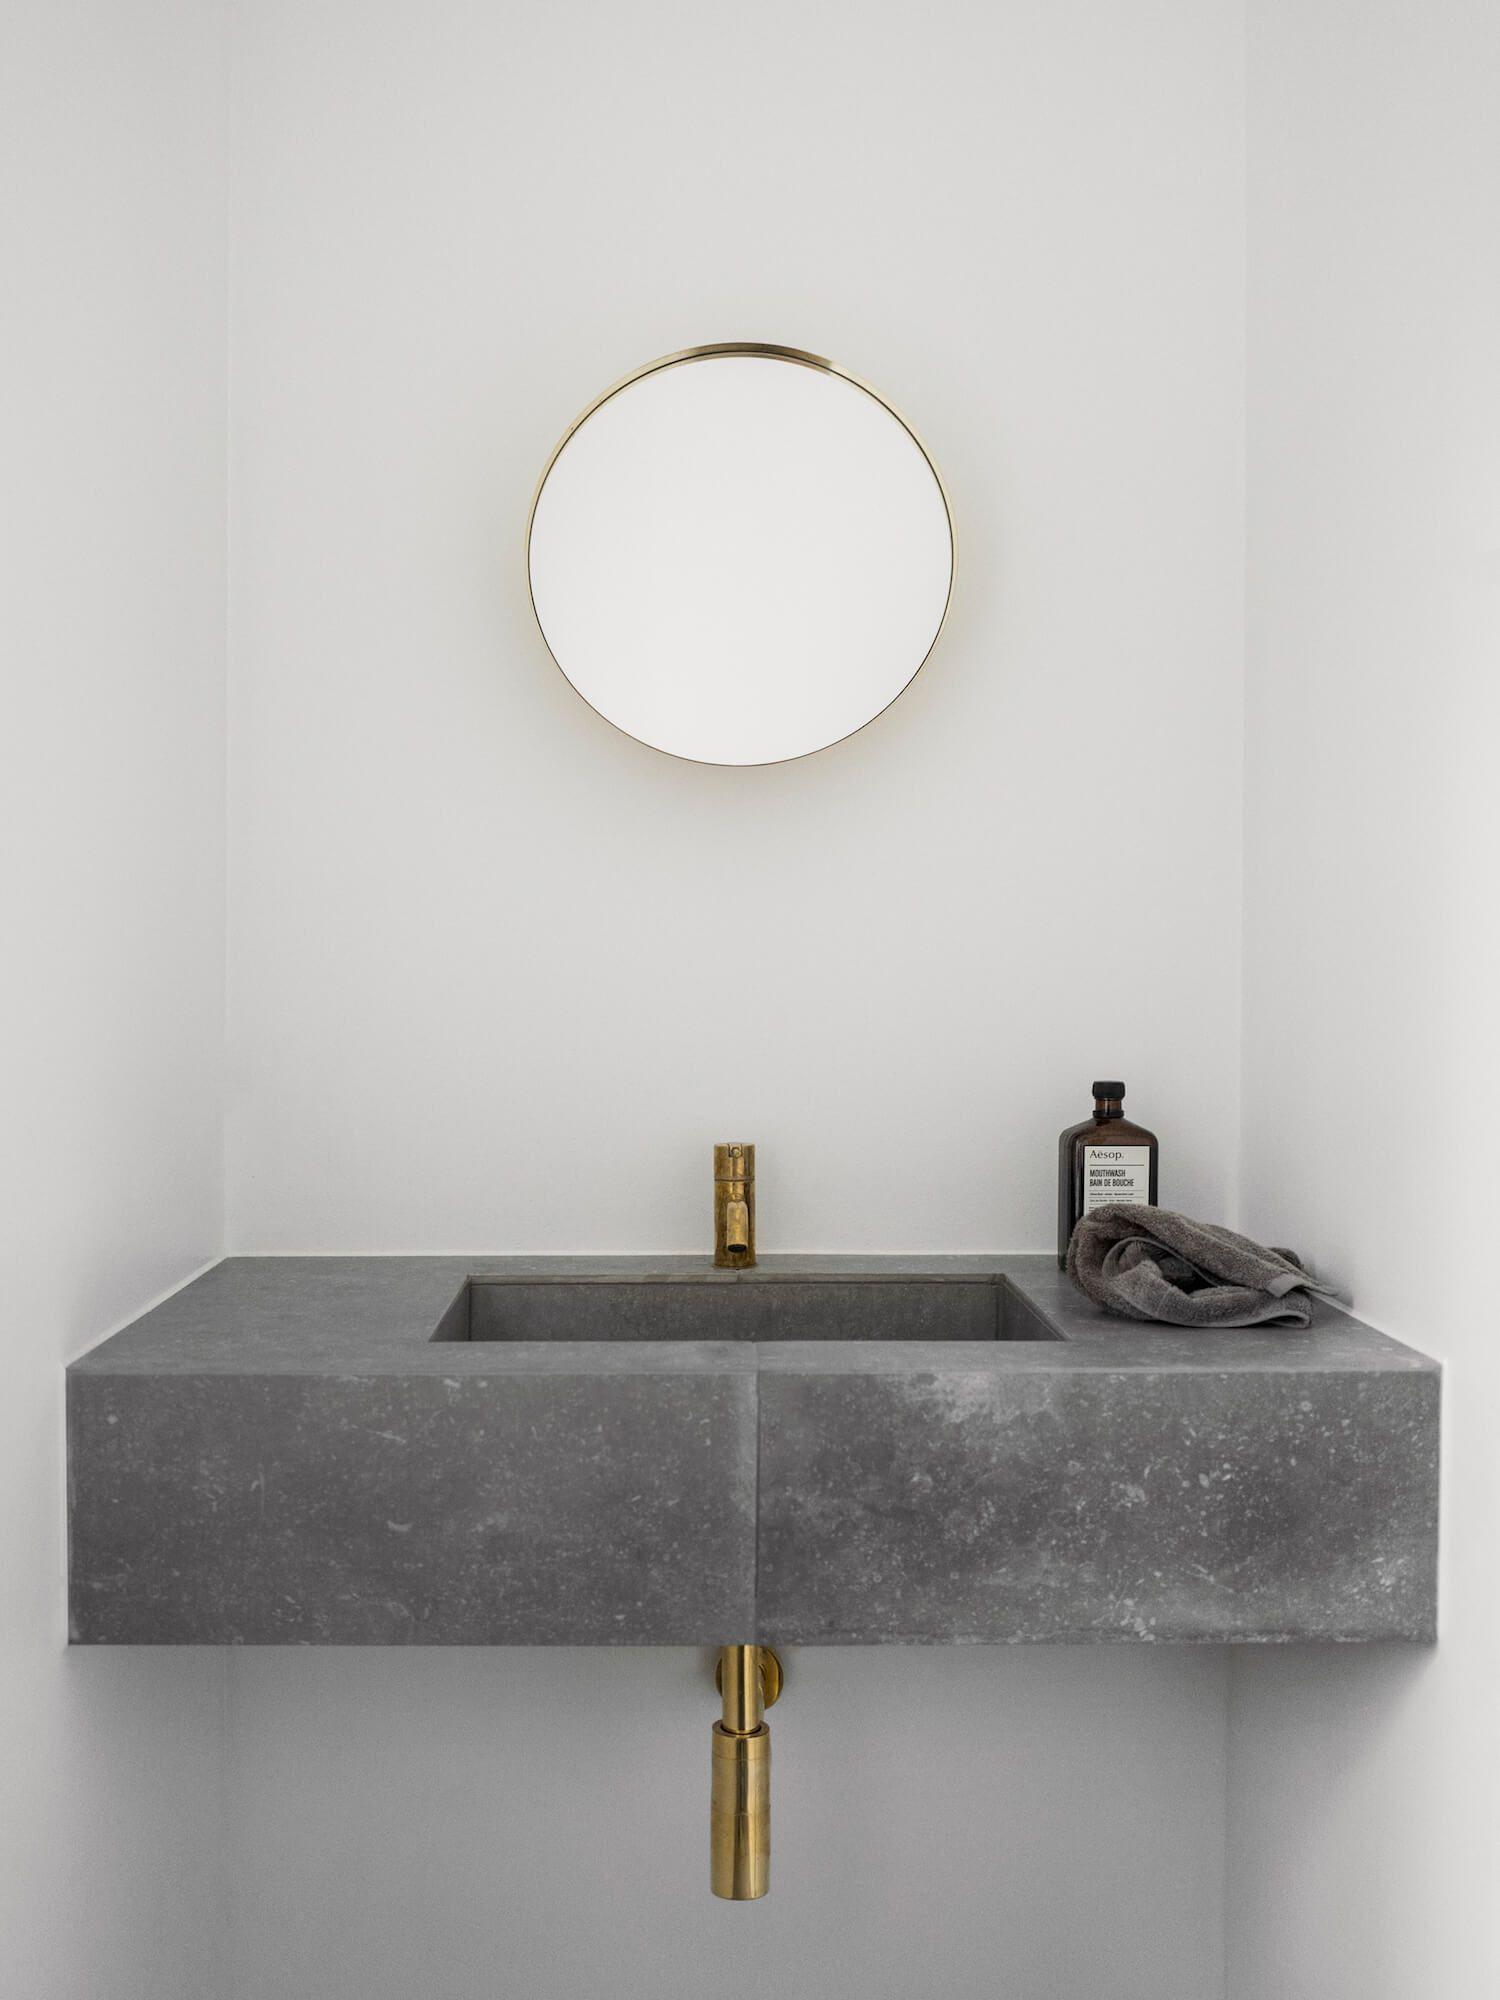 Poul Henningsen S Copenhagen Apartment By Norm Architects Est Living Minimalist Bathroom Modern Bathroom Amazing Bathrooms